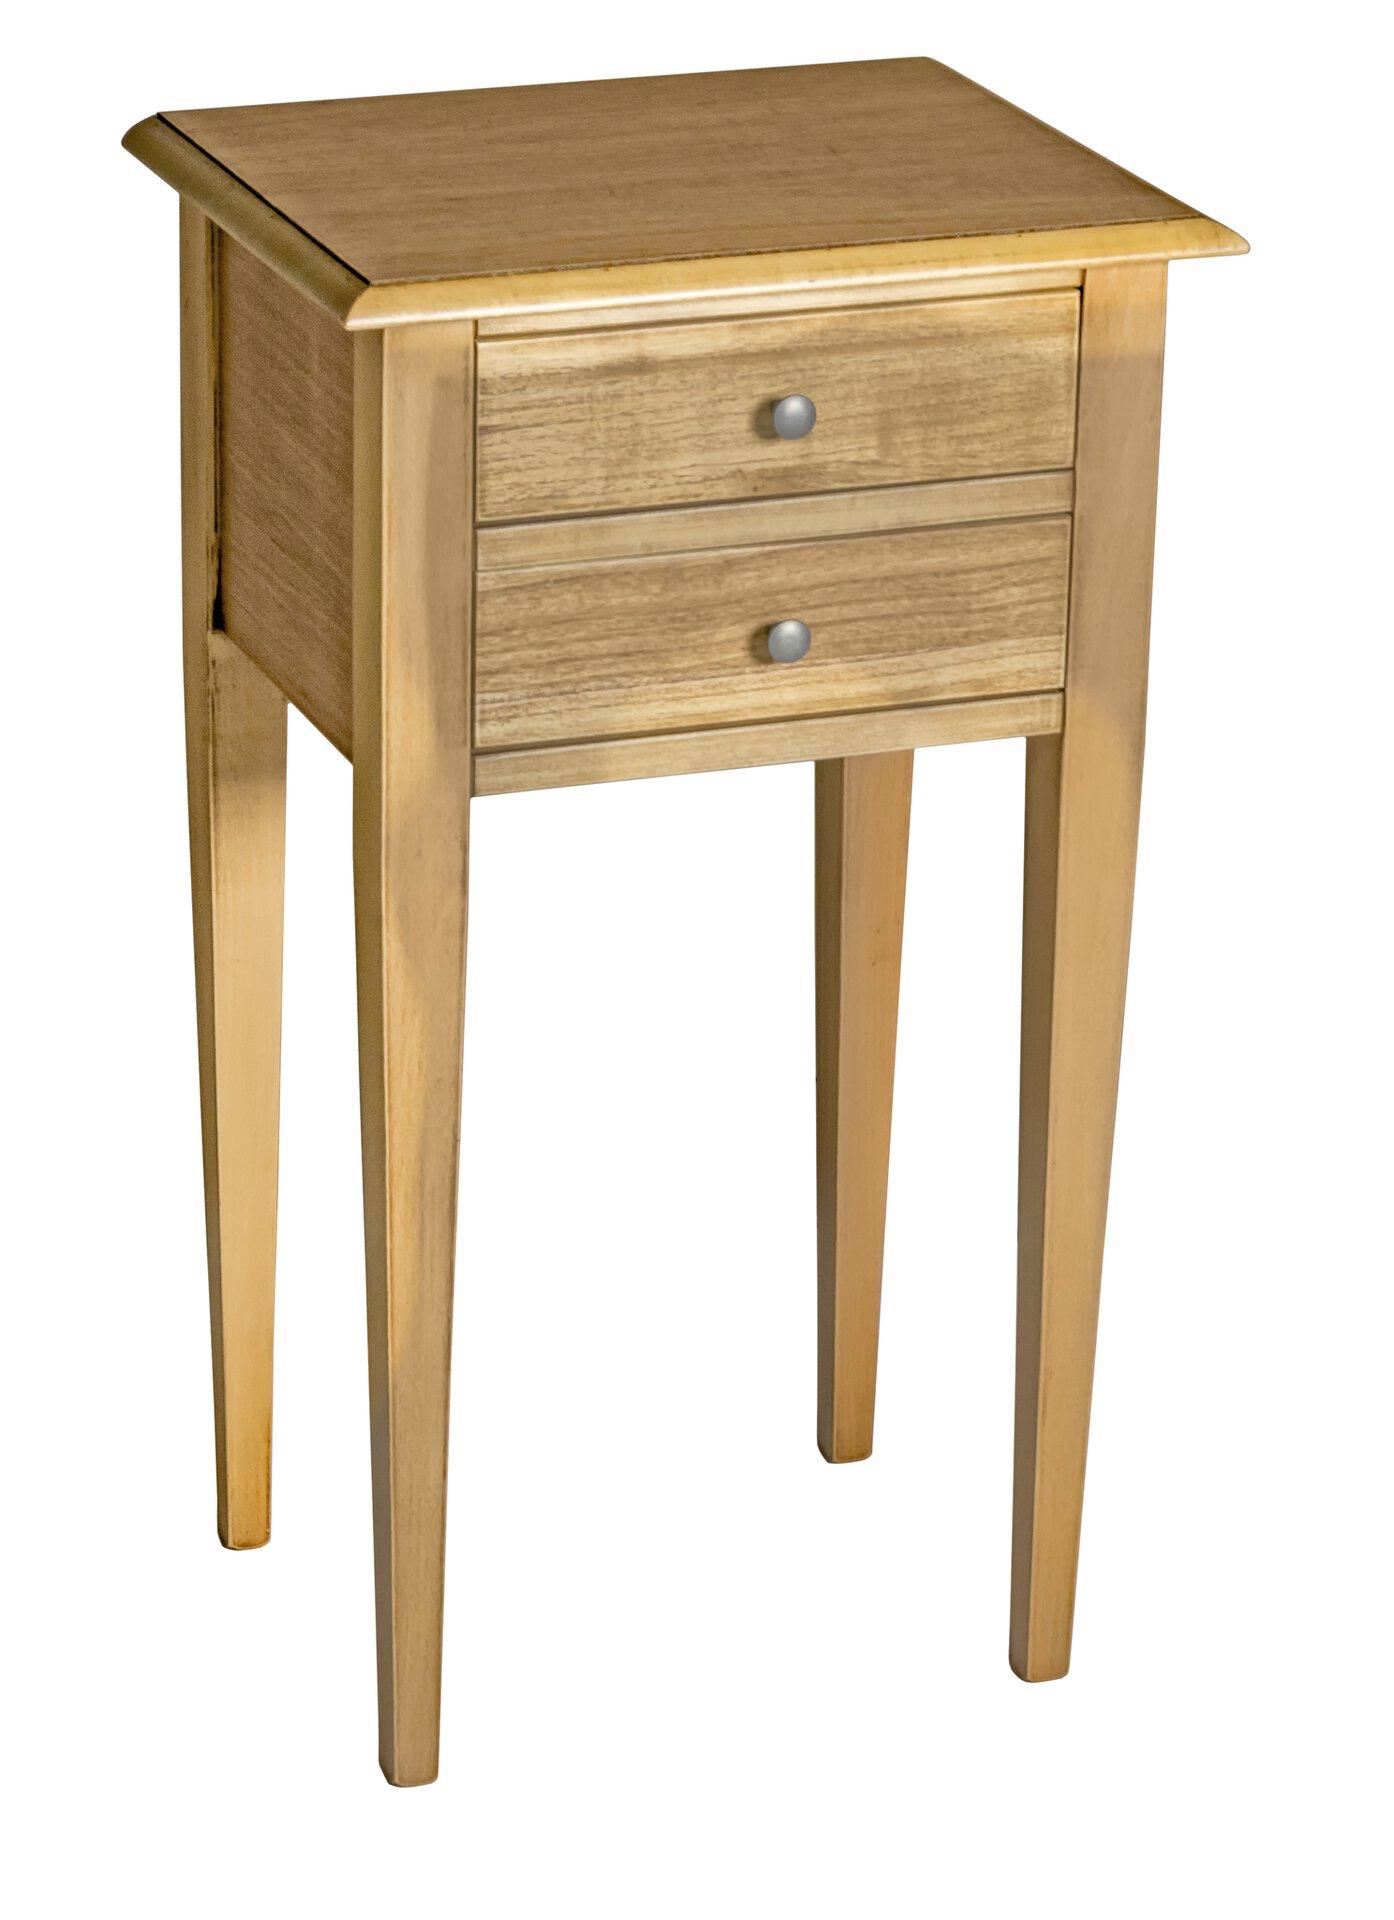 Kommode IS-Stilmöbel Holz